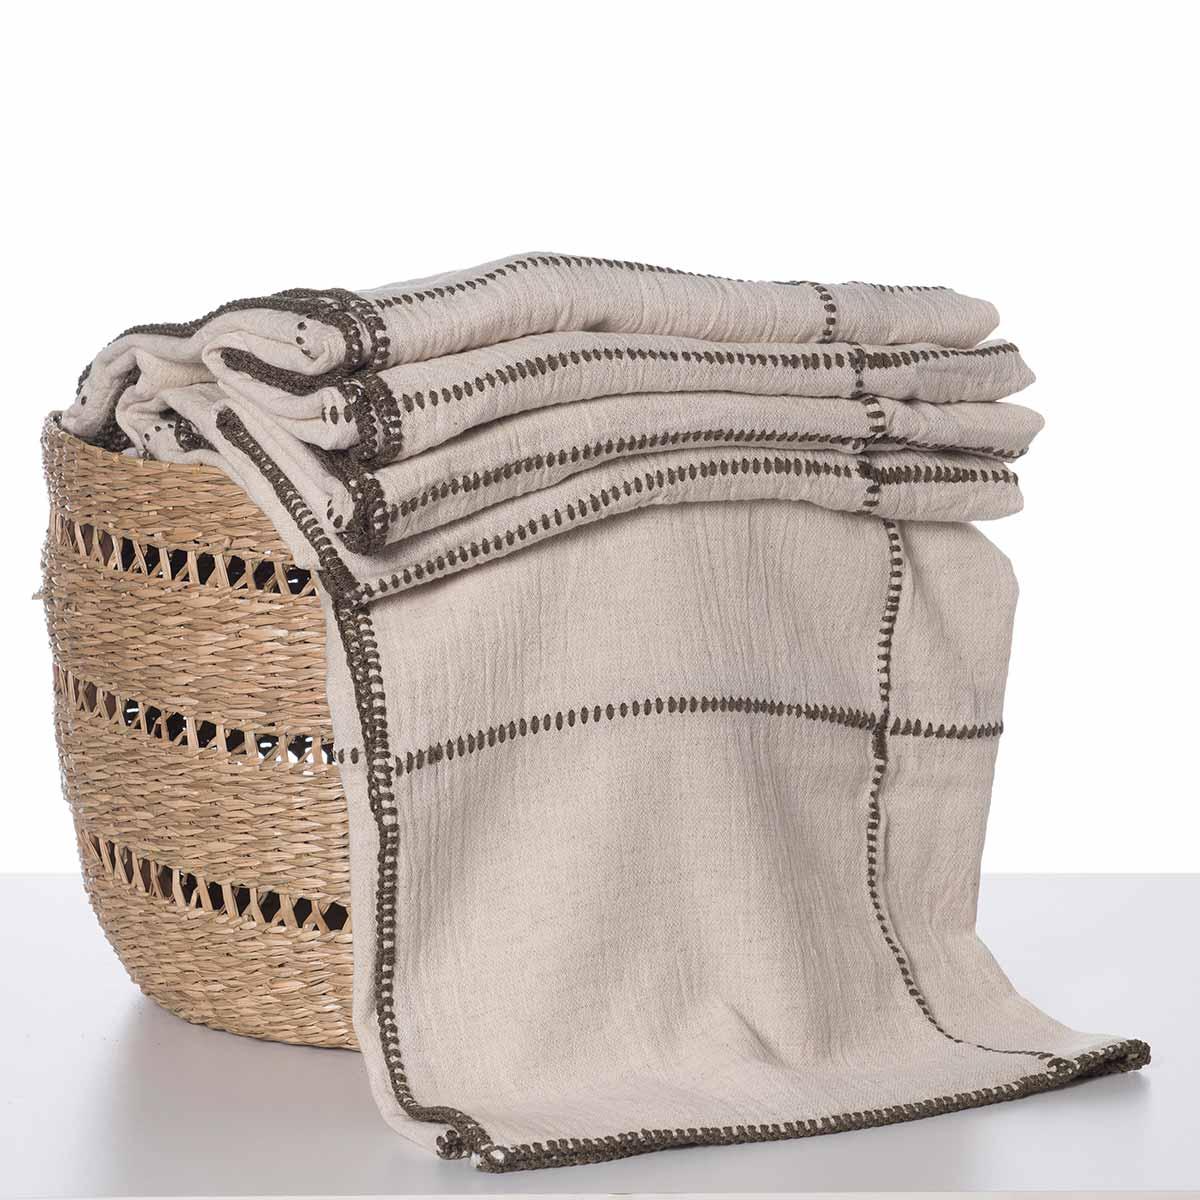 Throw - Nature / Khaki stitched (Patchwork)